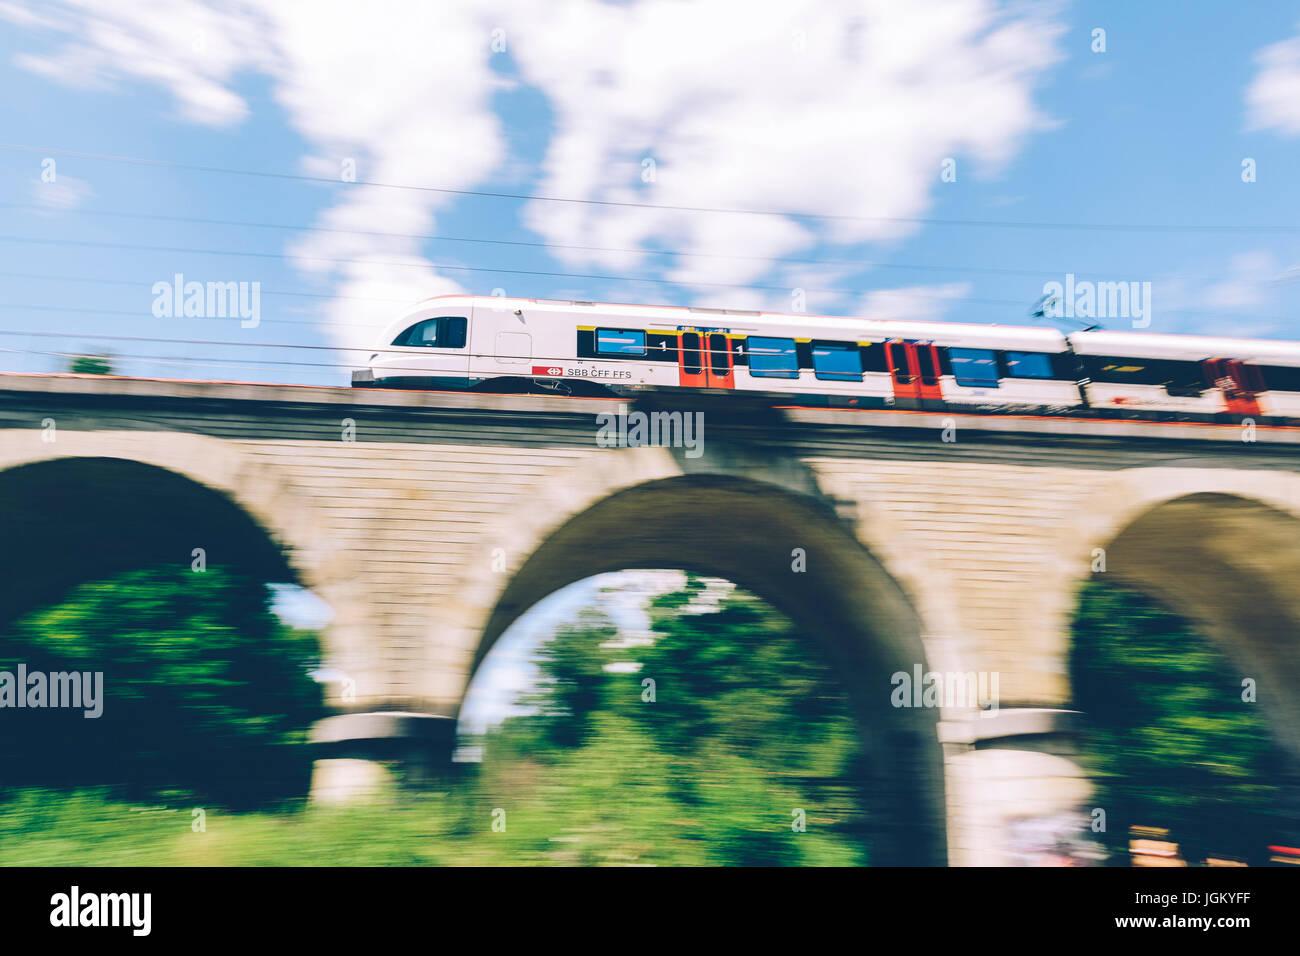 Geneva, Switzerland - June 25, 2017: Swiss regional train passing over a bridge in the Geneva Canton region, with motion blur. Stock Photo